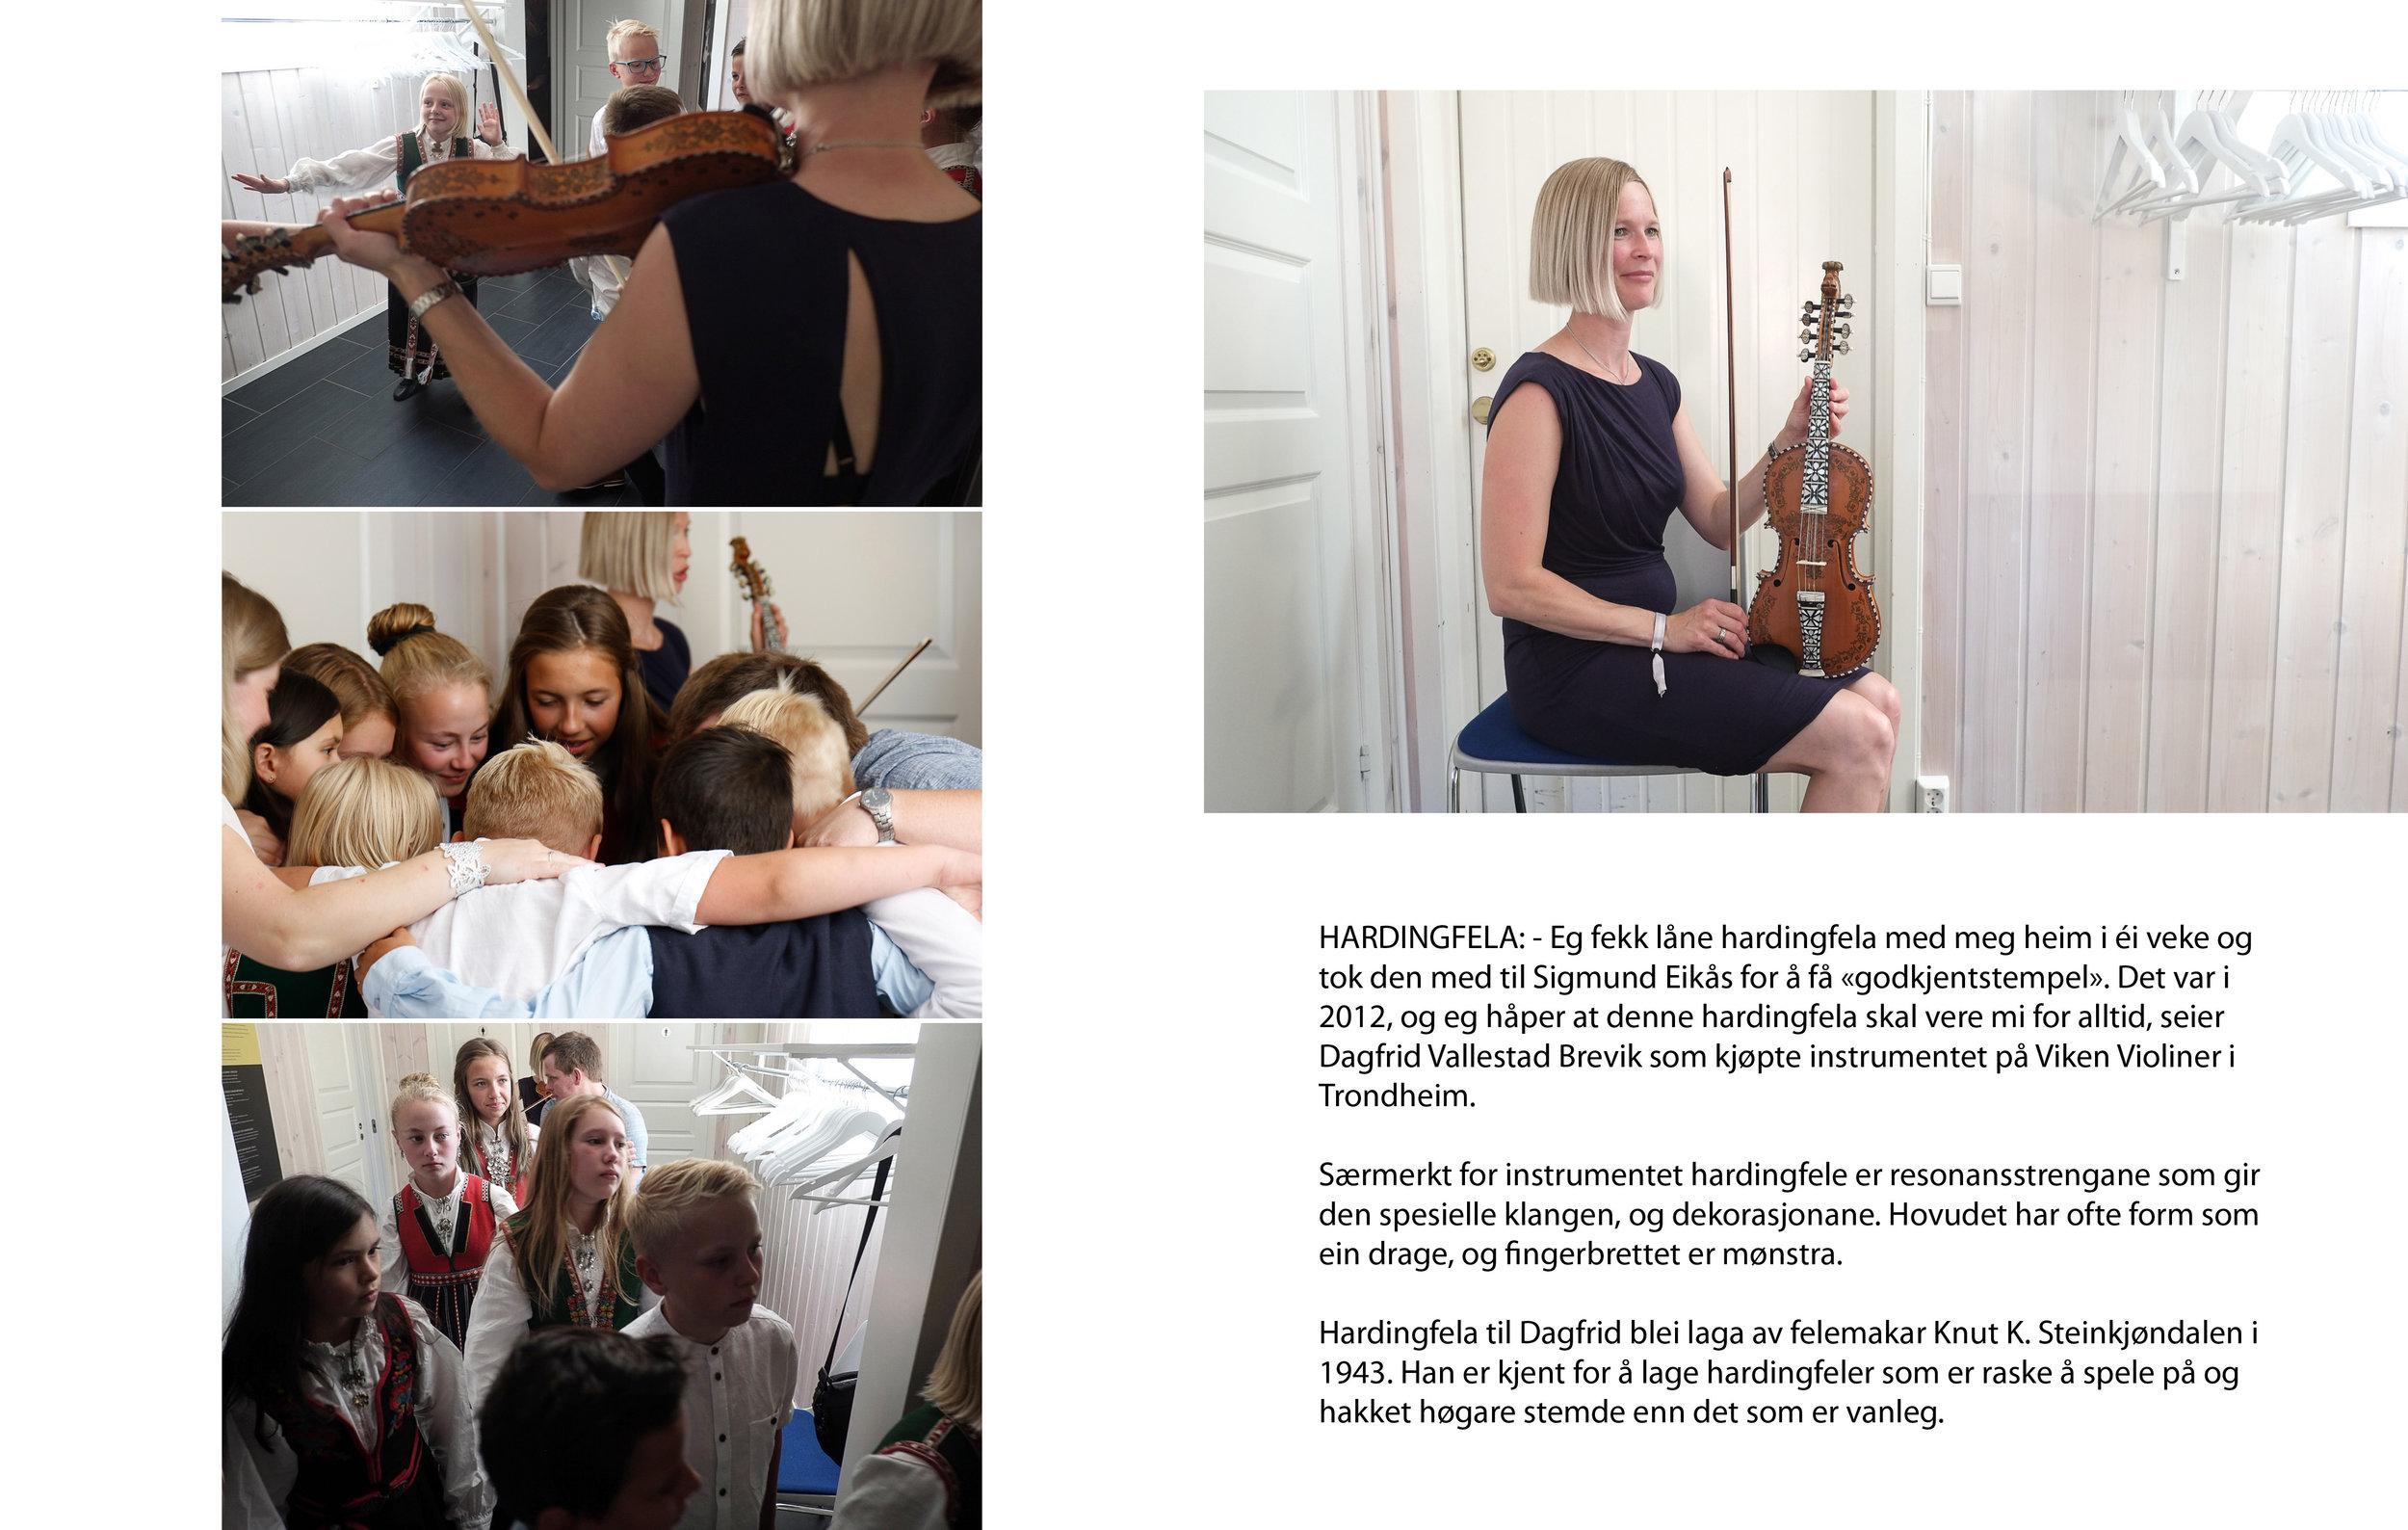 FordefestivalMagazineForWeb Page 30.jpg